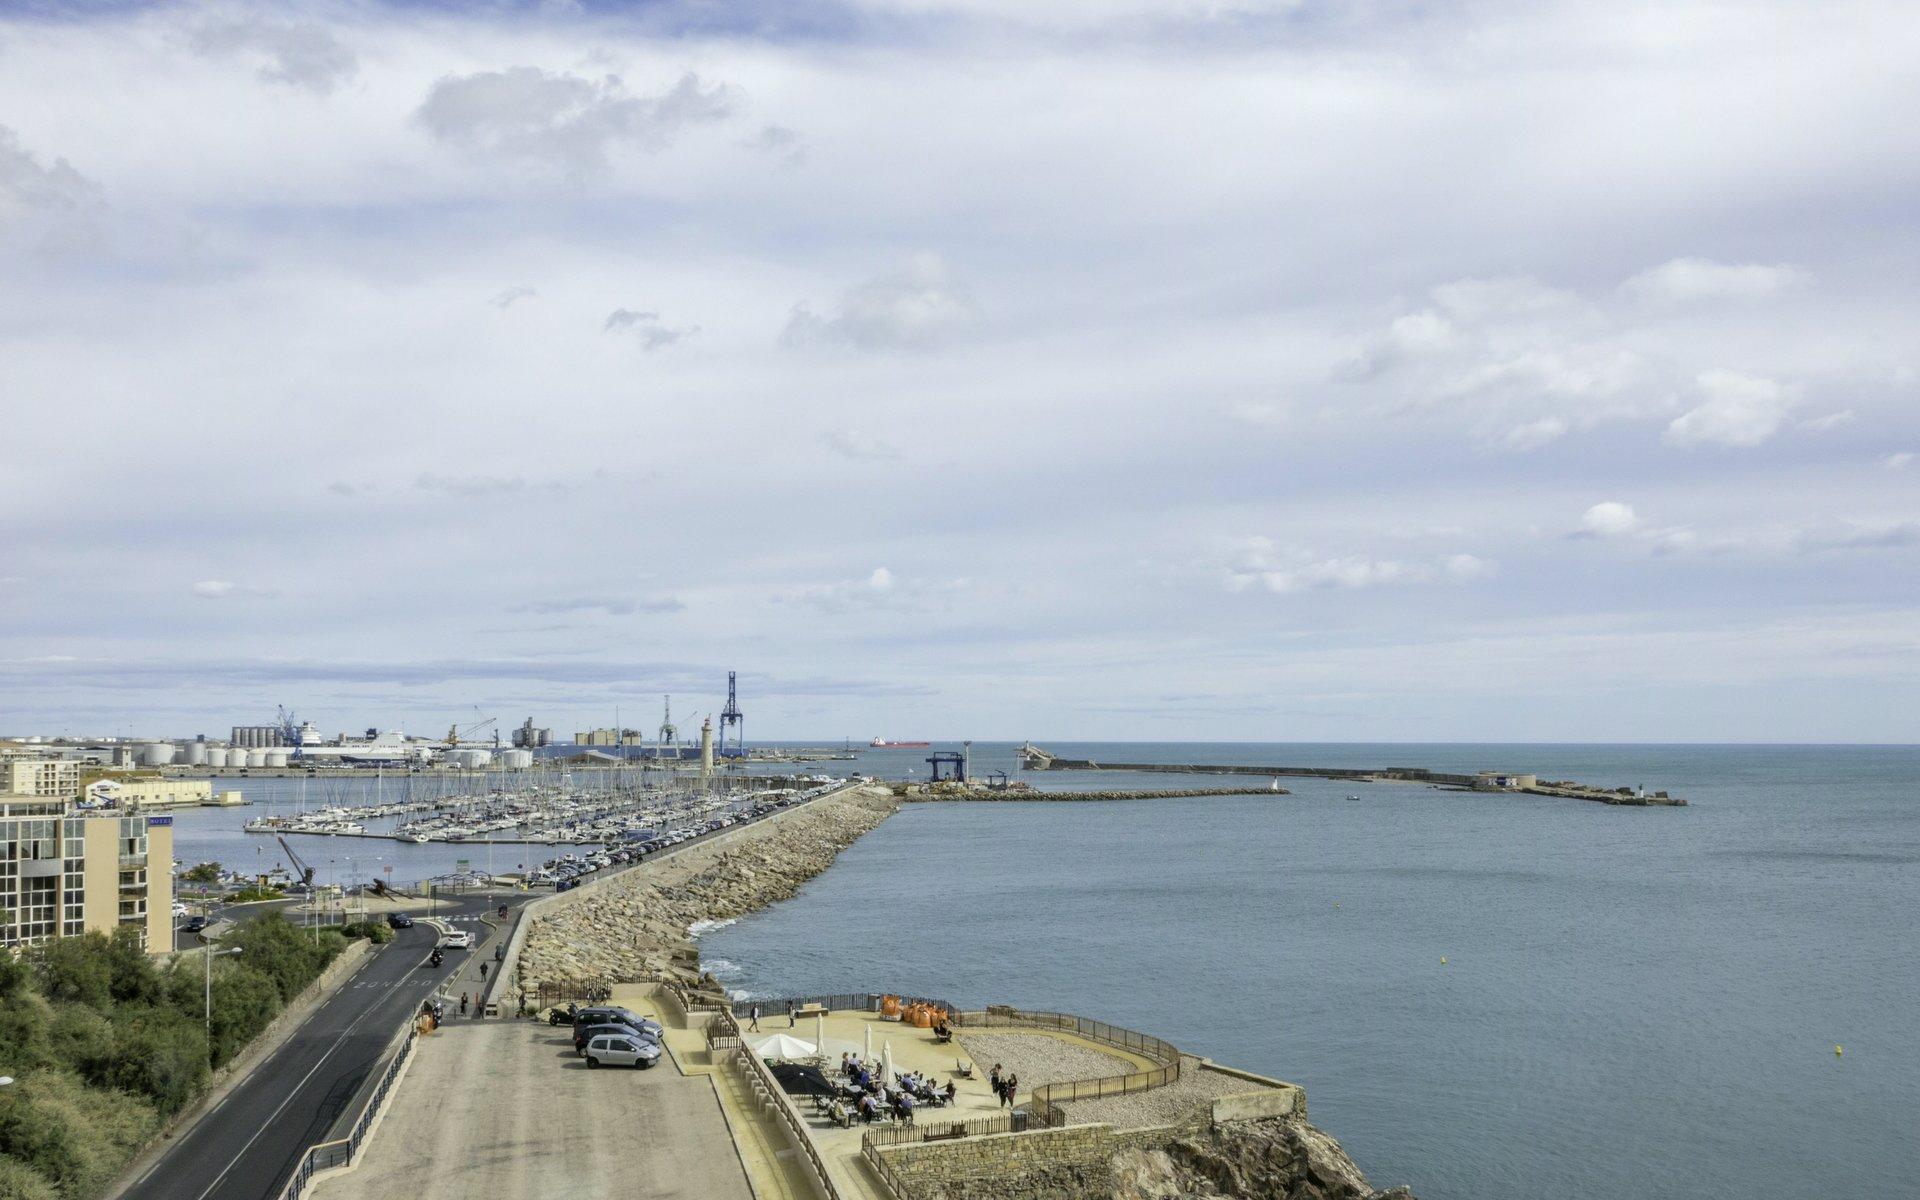 Blick auf den Hafen vom Théâtre de la Mer in Sète